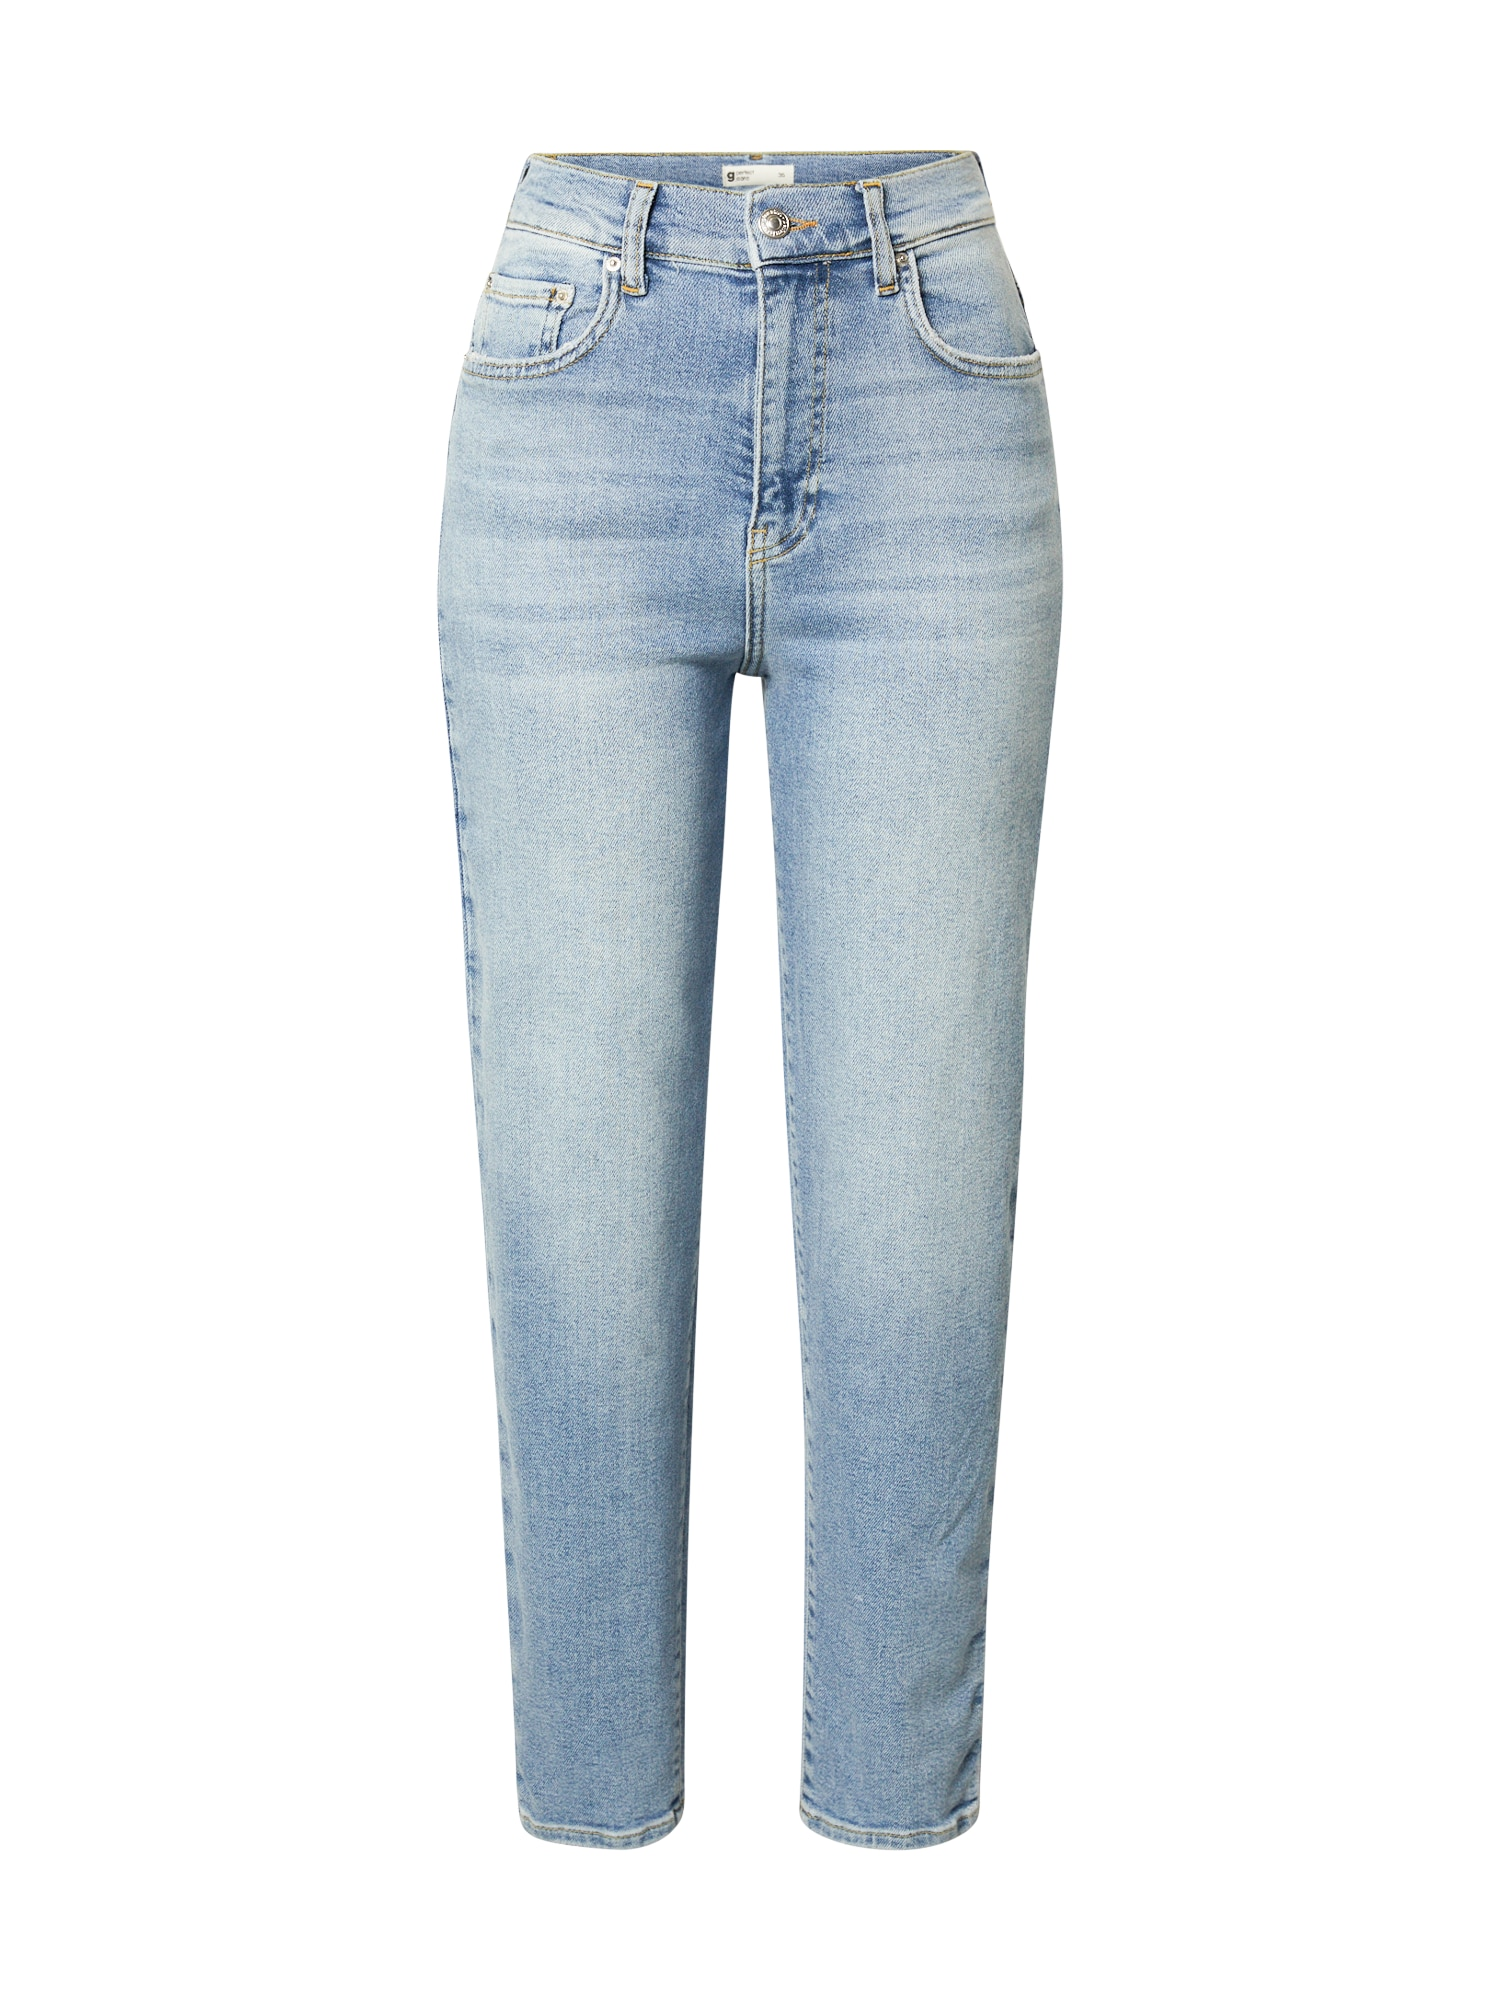 Gina Tricot Džinsai tamsiai (džinso) mėlyna